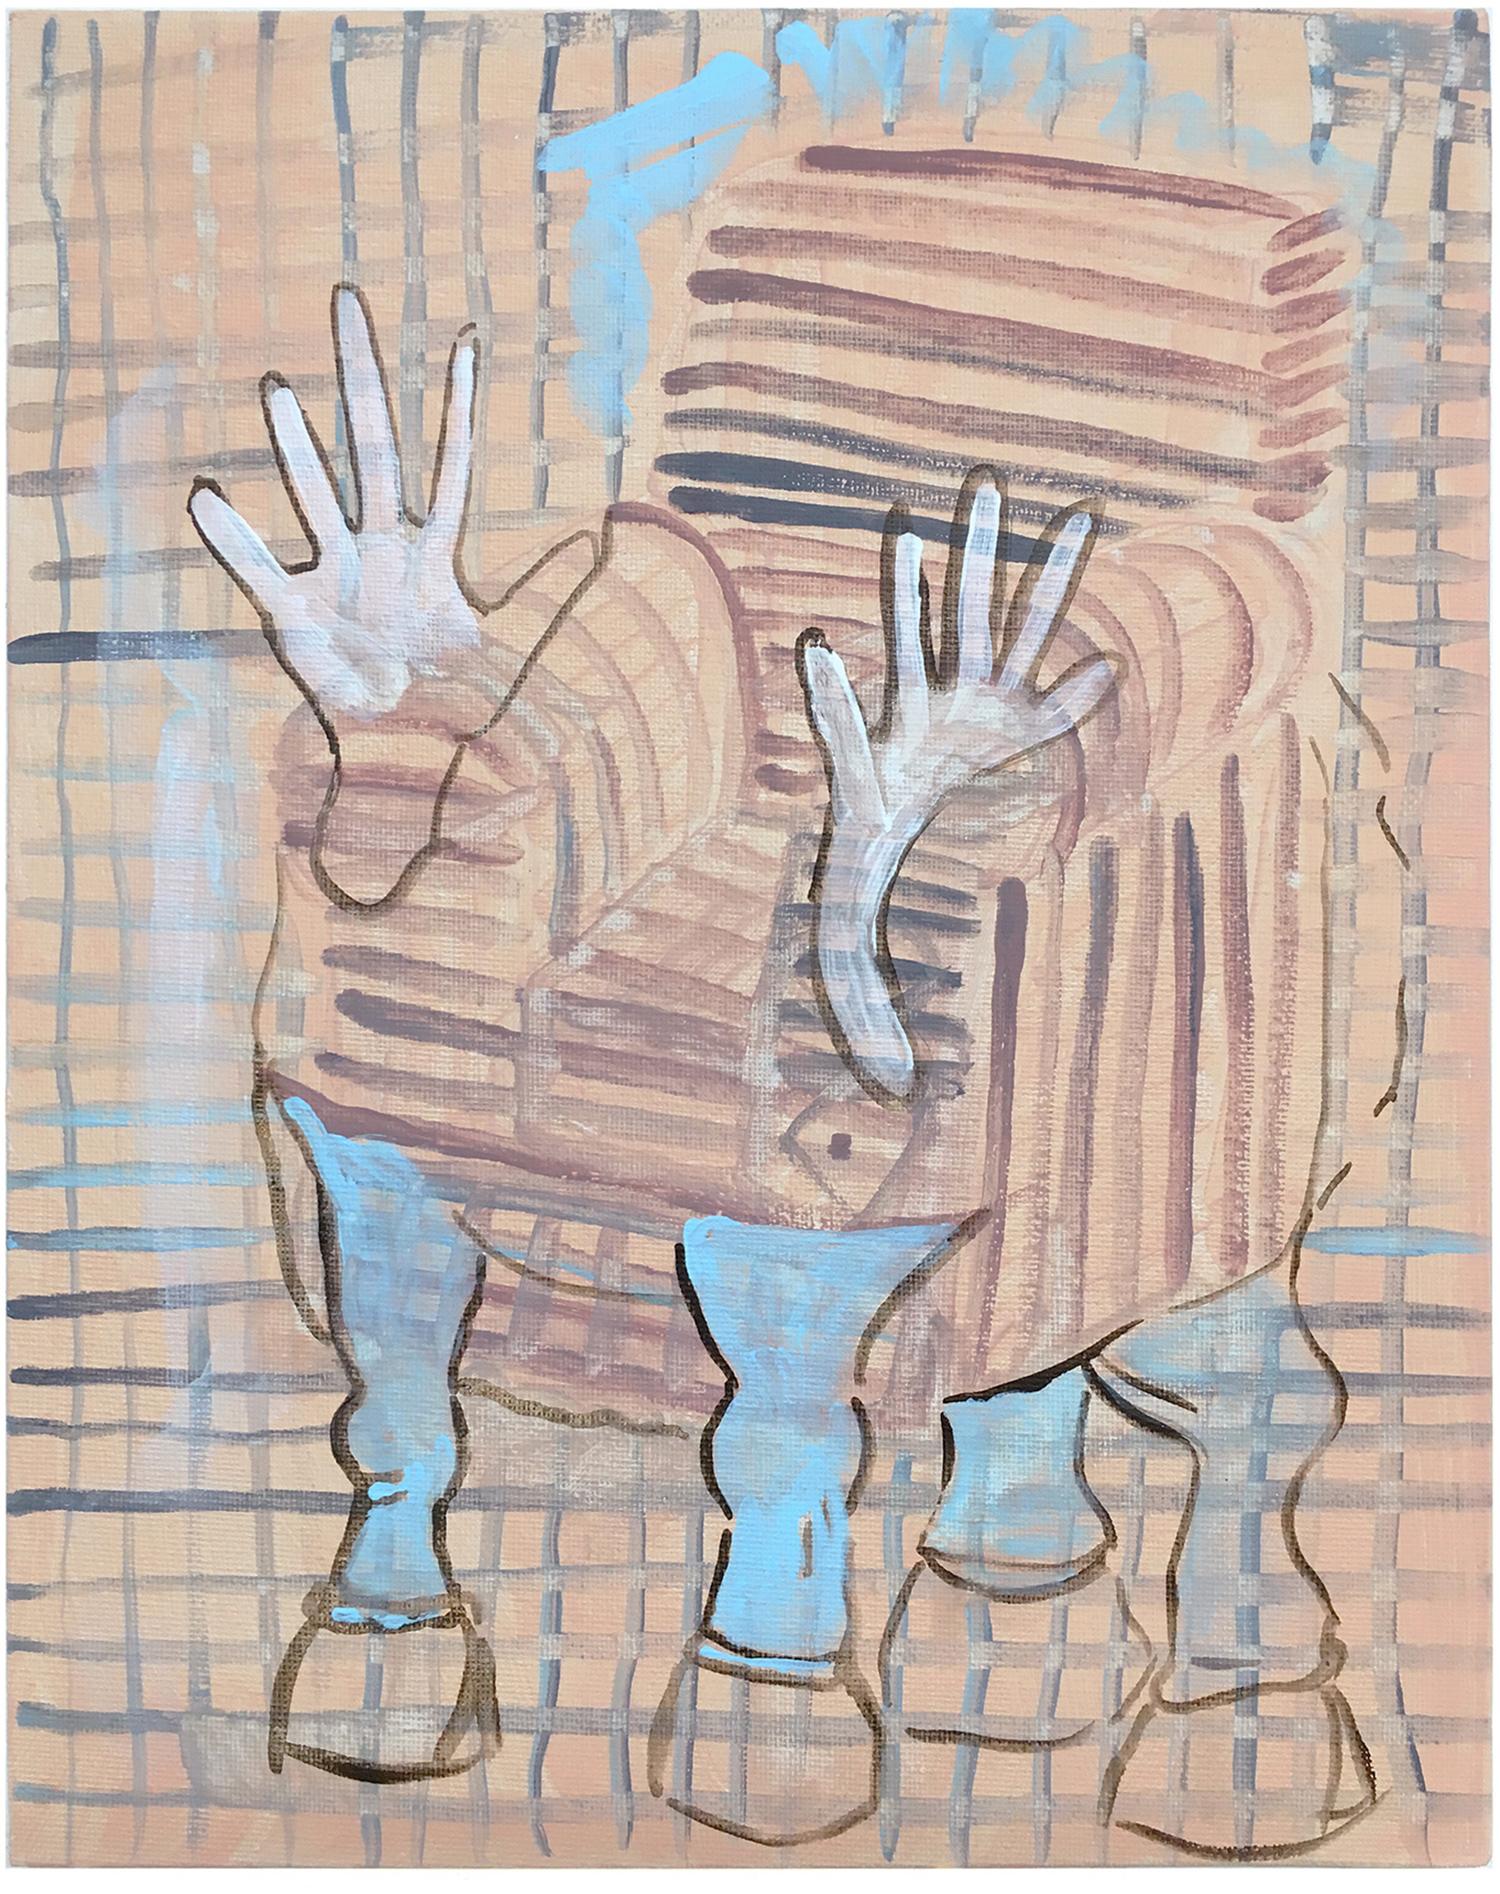 Nina-Tobien-comic-pattern-figure-decomposed-composed-armchair-skincolor-hooves-modern-mythology-fantasy